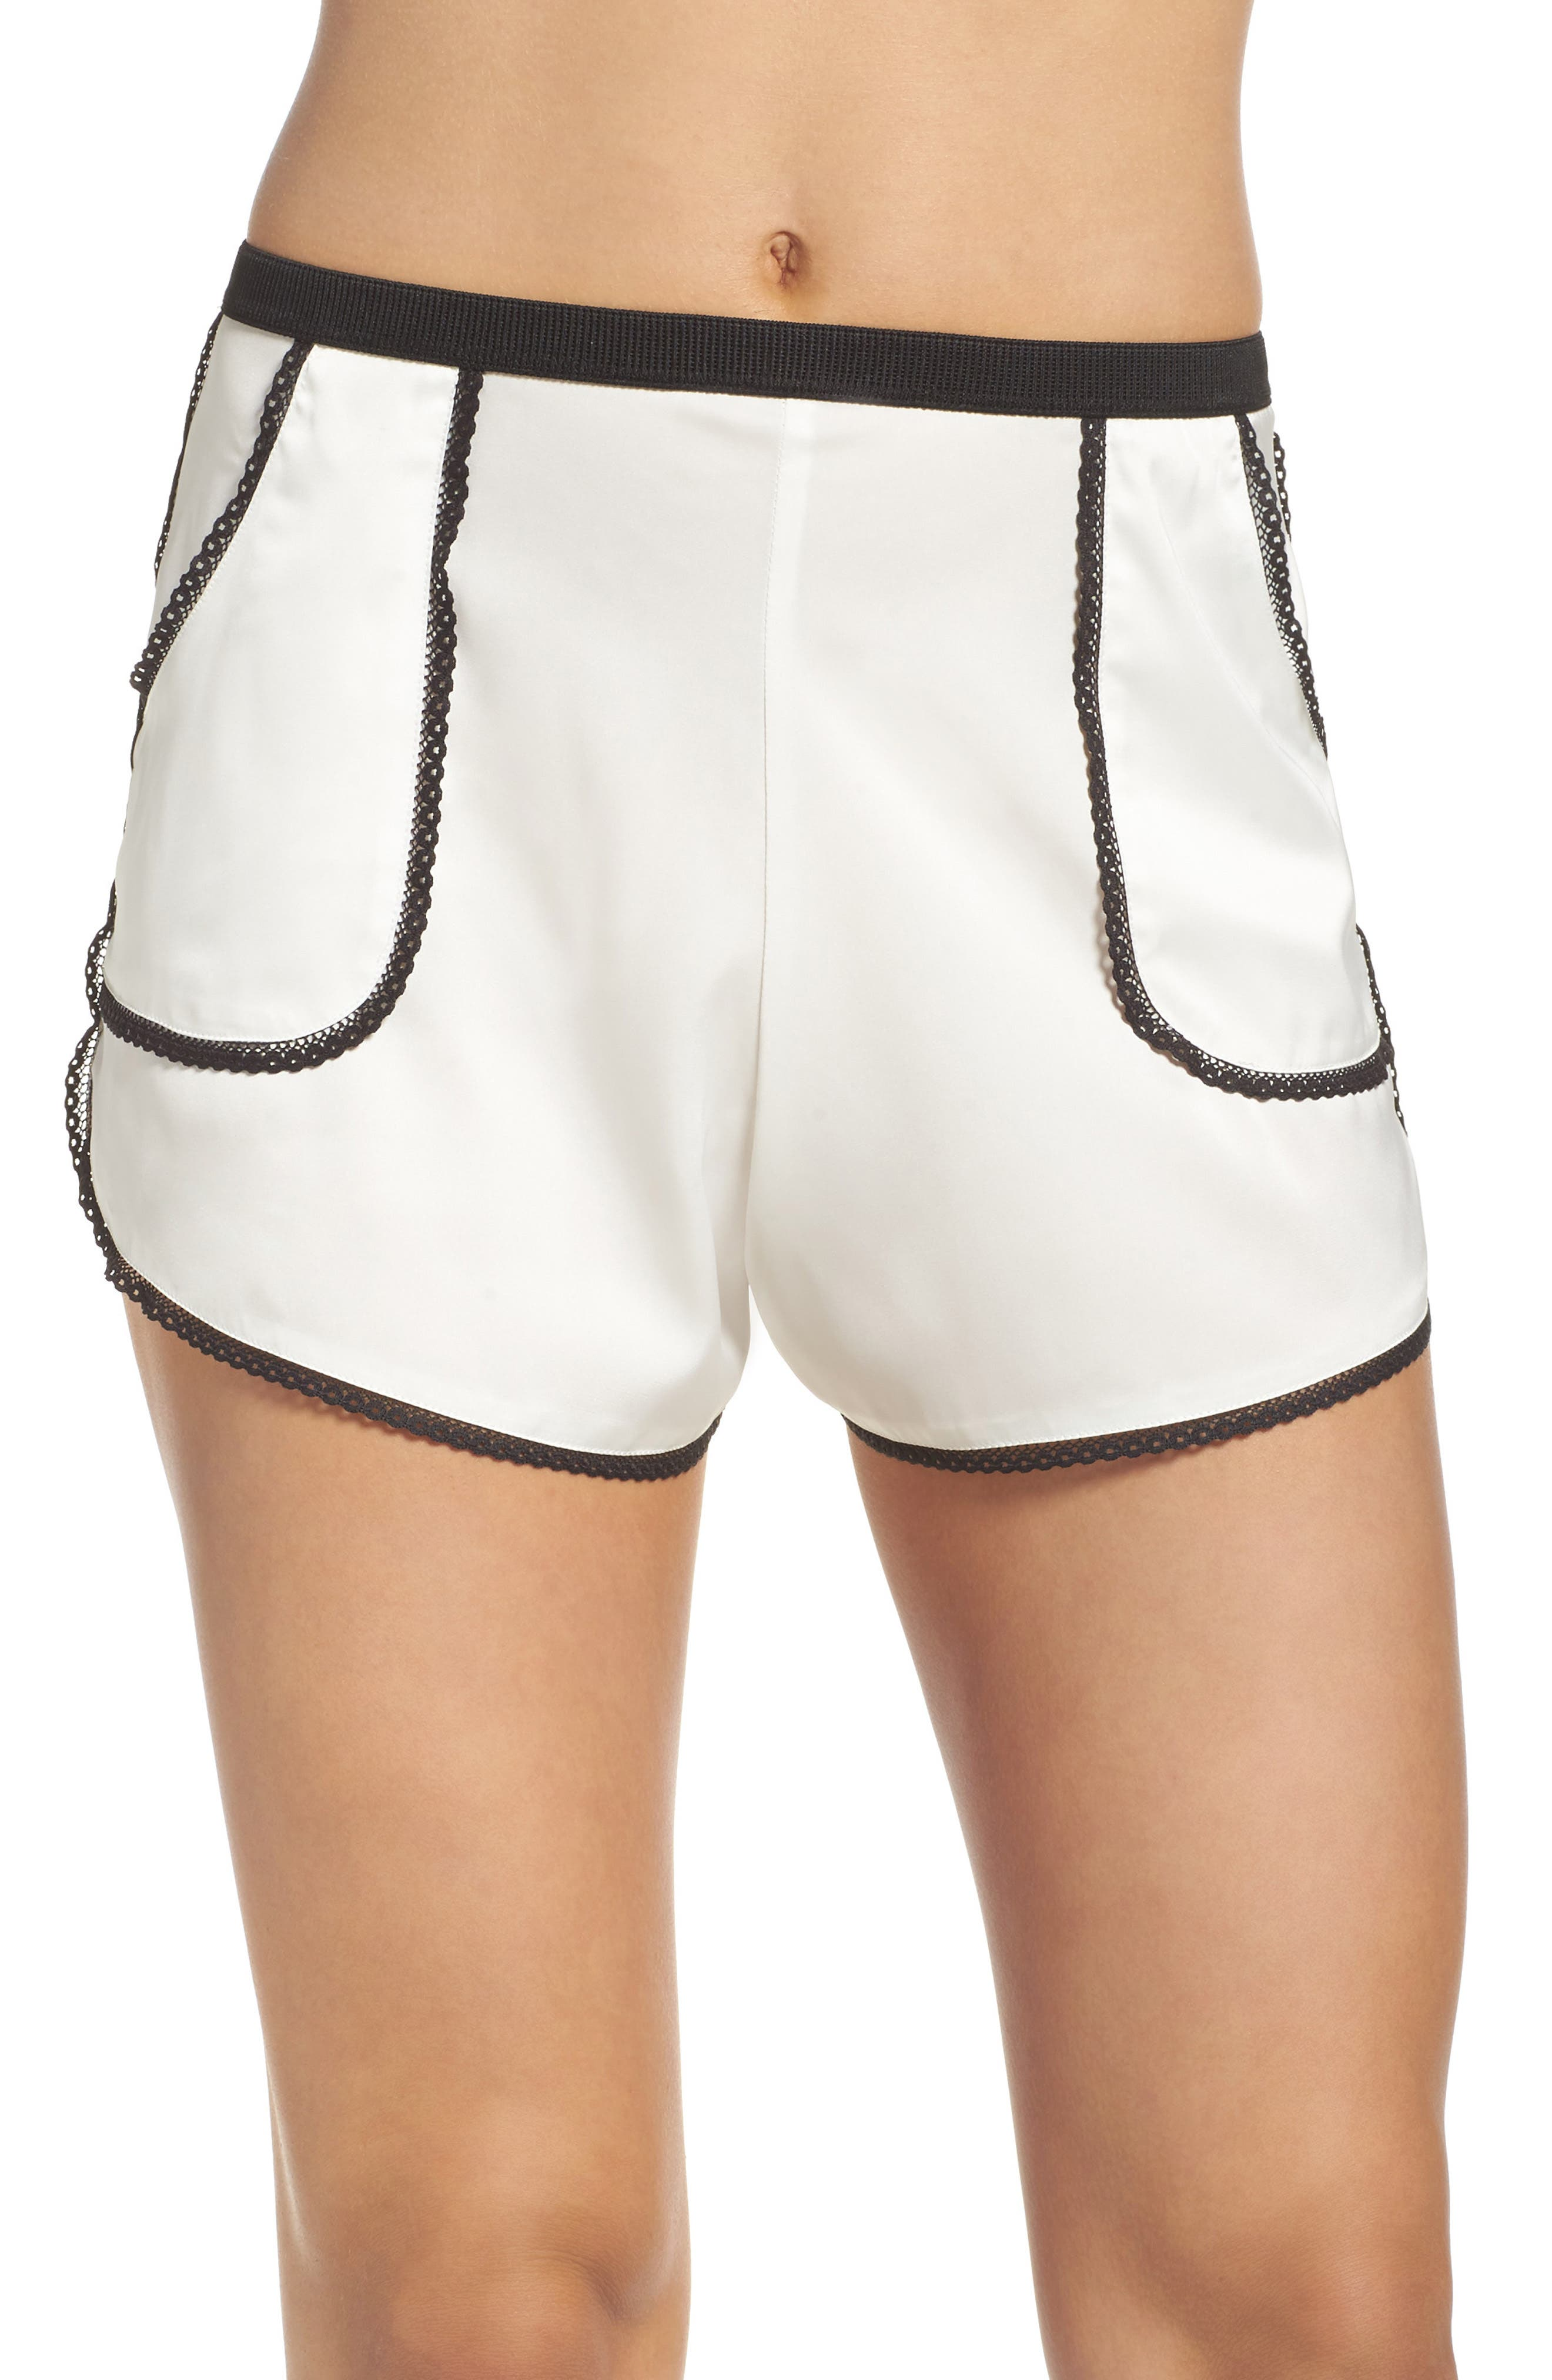 Thistle & Spire Devoe Satin Pajama Shorts